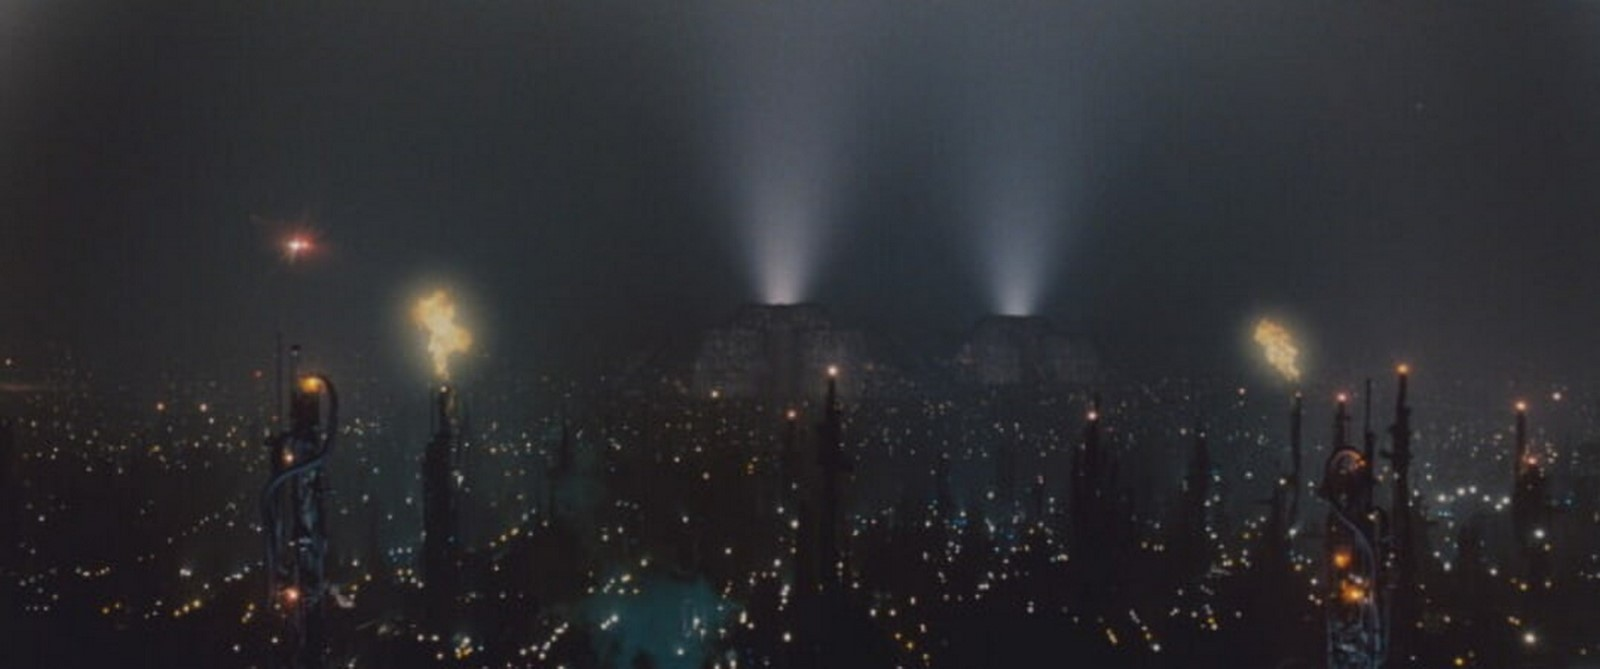 Movie in Focus: Blade Runner (1982) - Sheet6